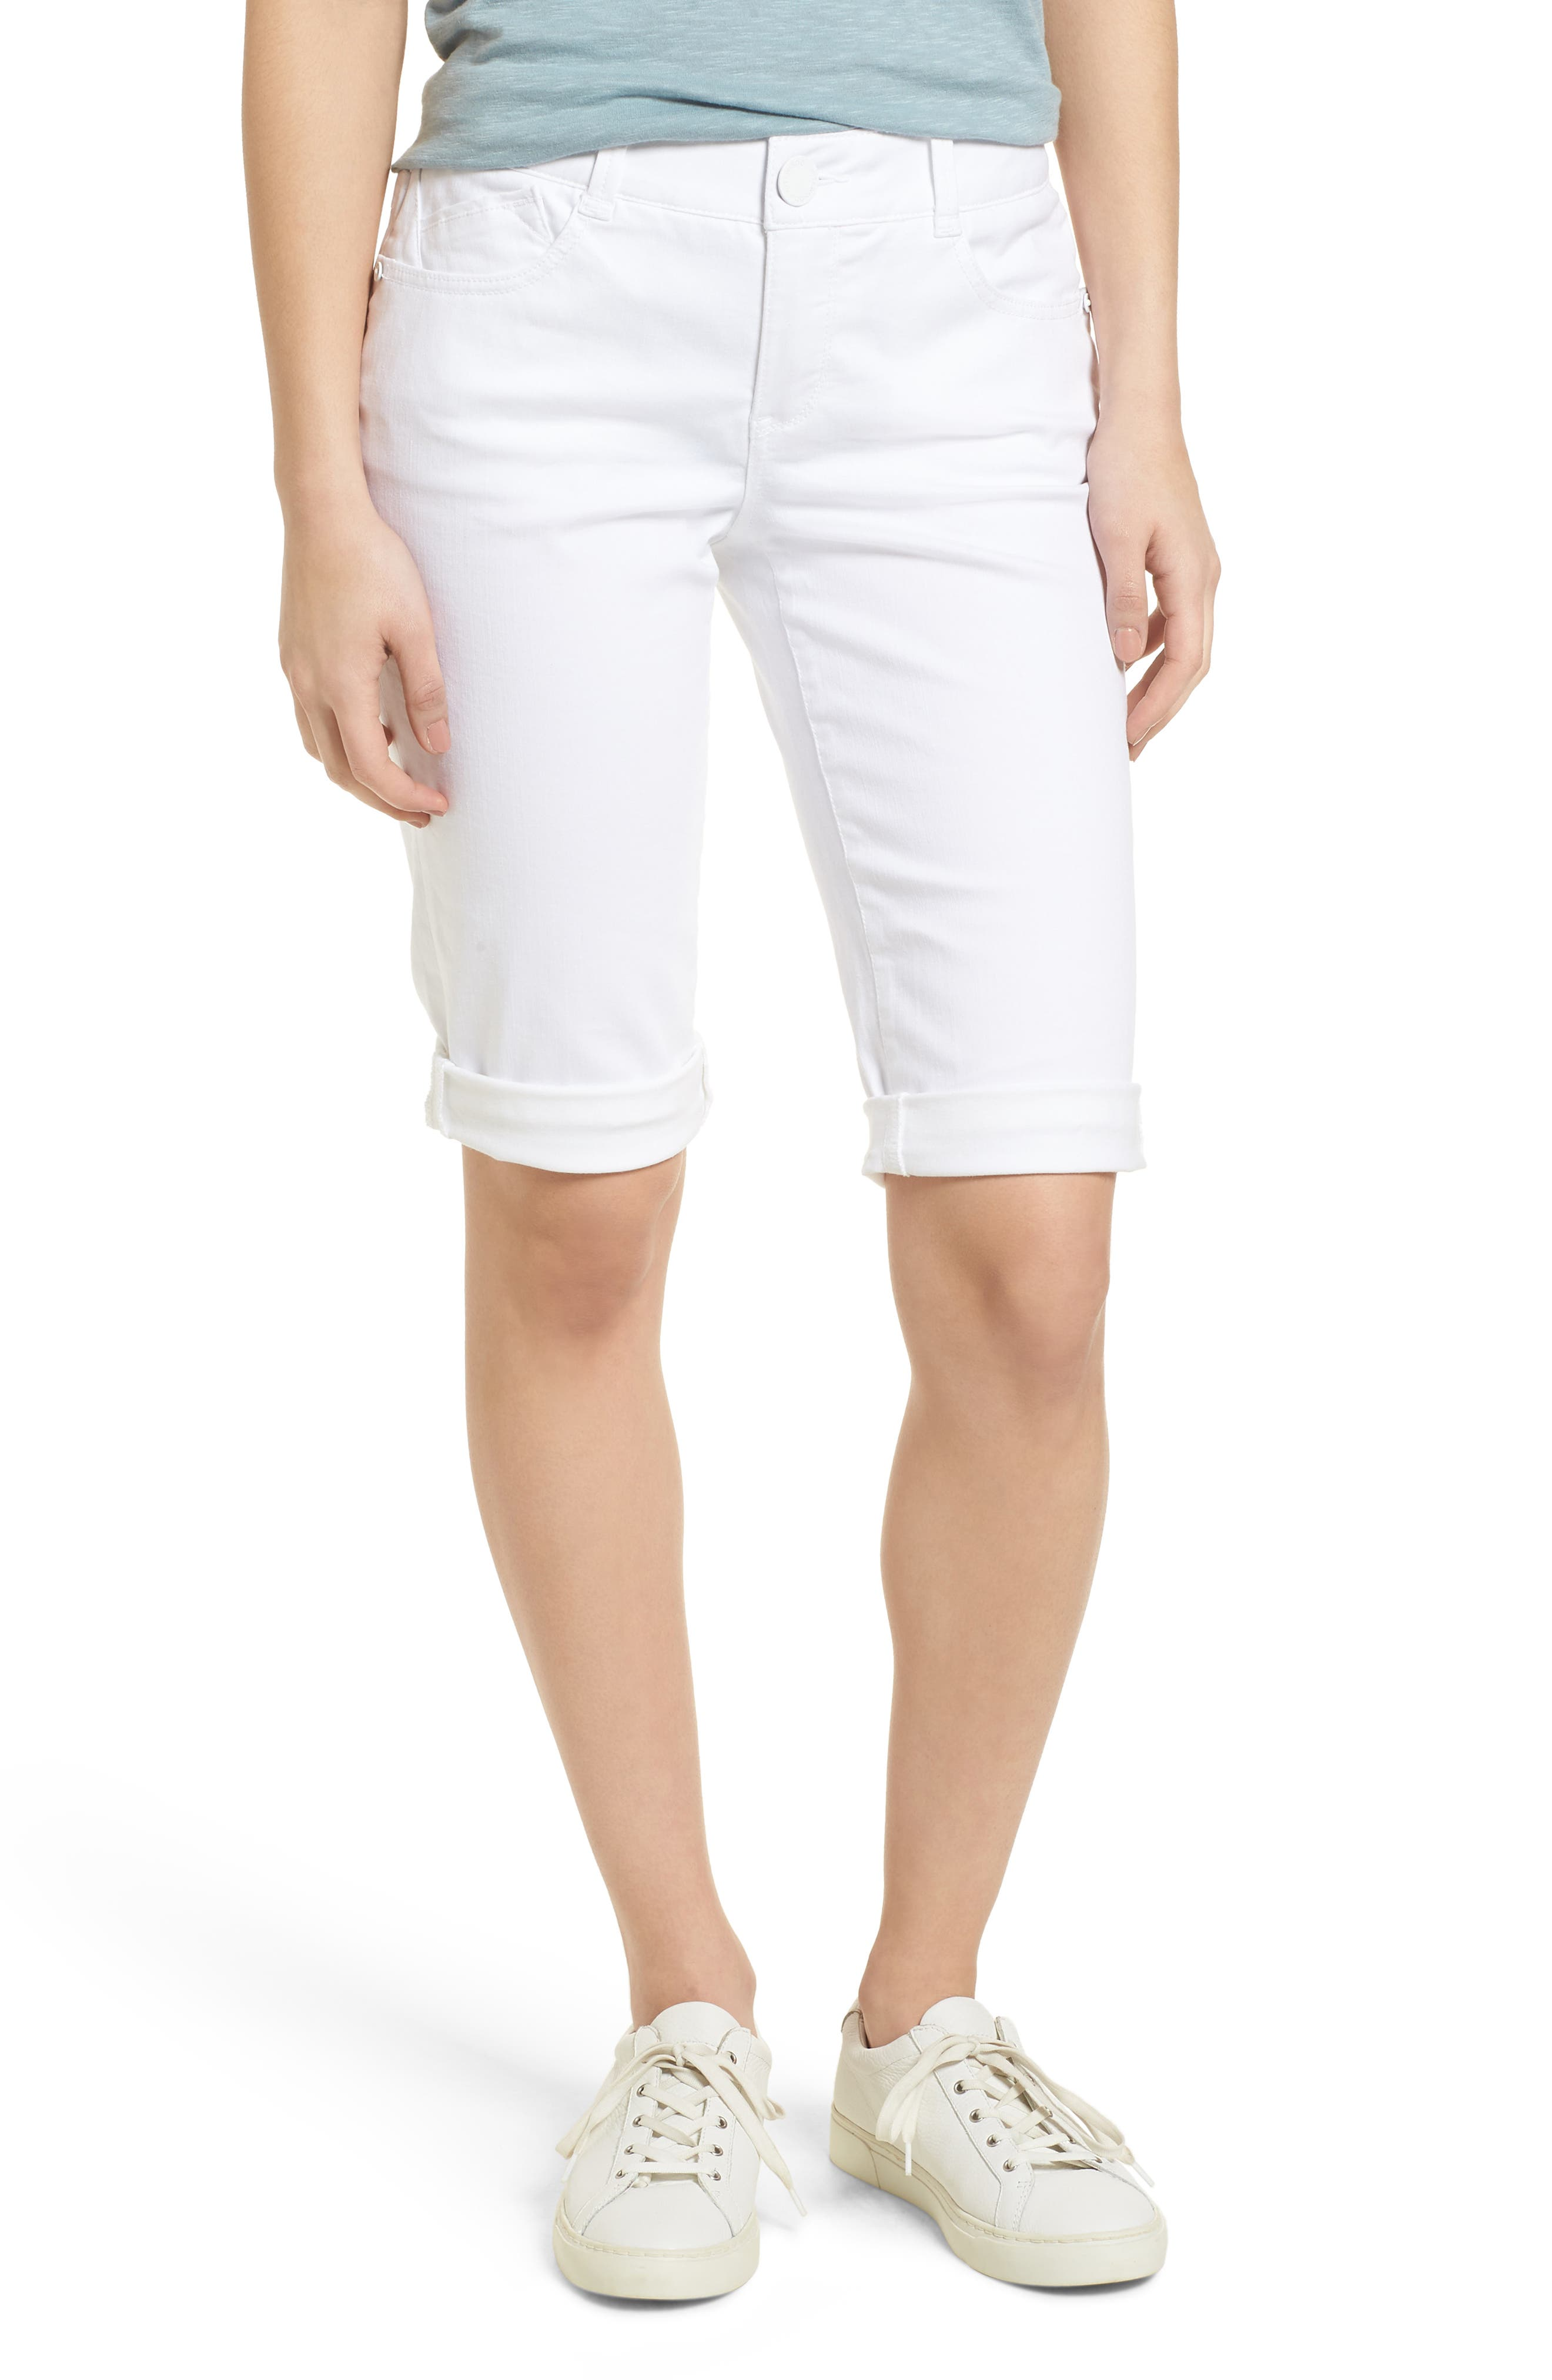 WIT & WISDOM, Ab-solution White Bermuda Shorts, Main thumbnail 1, color, OPTIC WHITE